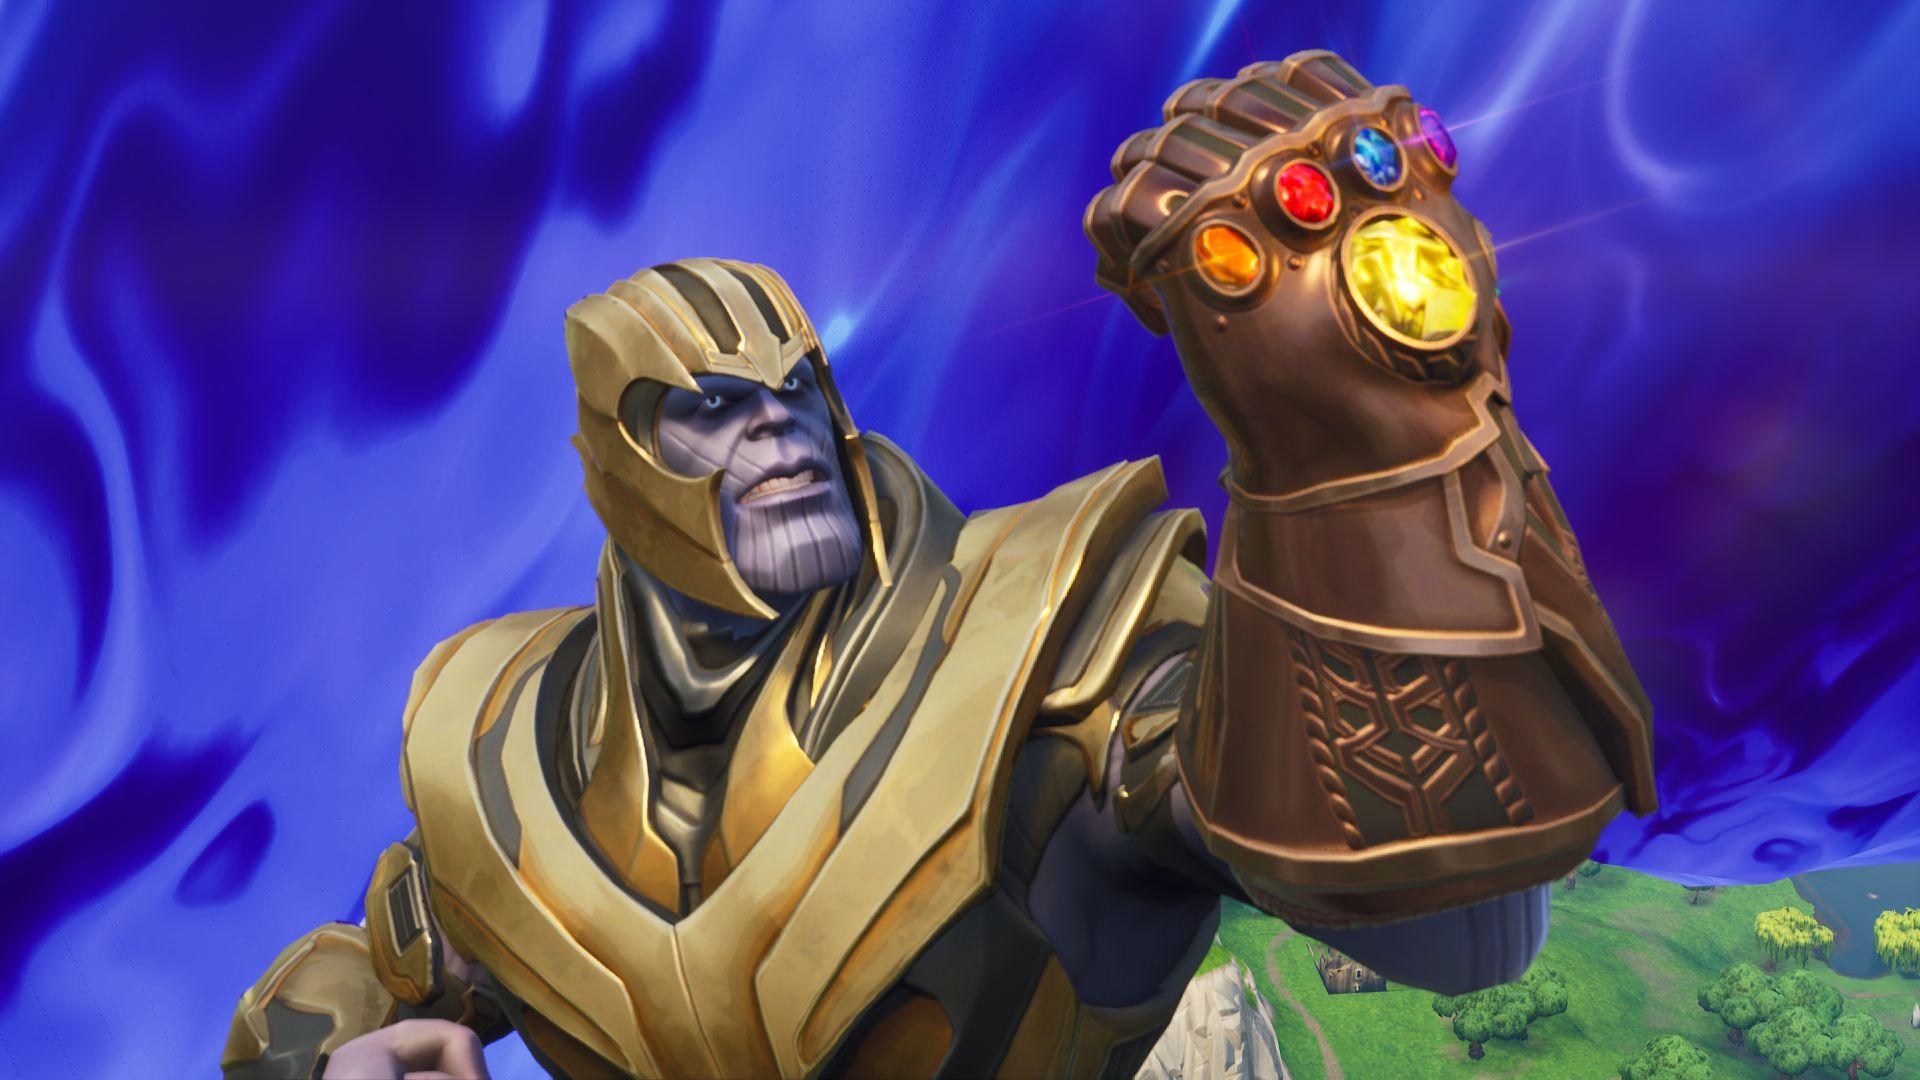 Thanos Fortnite Emots Thanos Vuelve A Fortnite Power Gaming Network